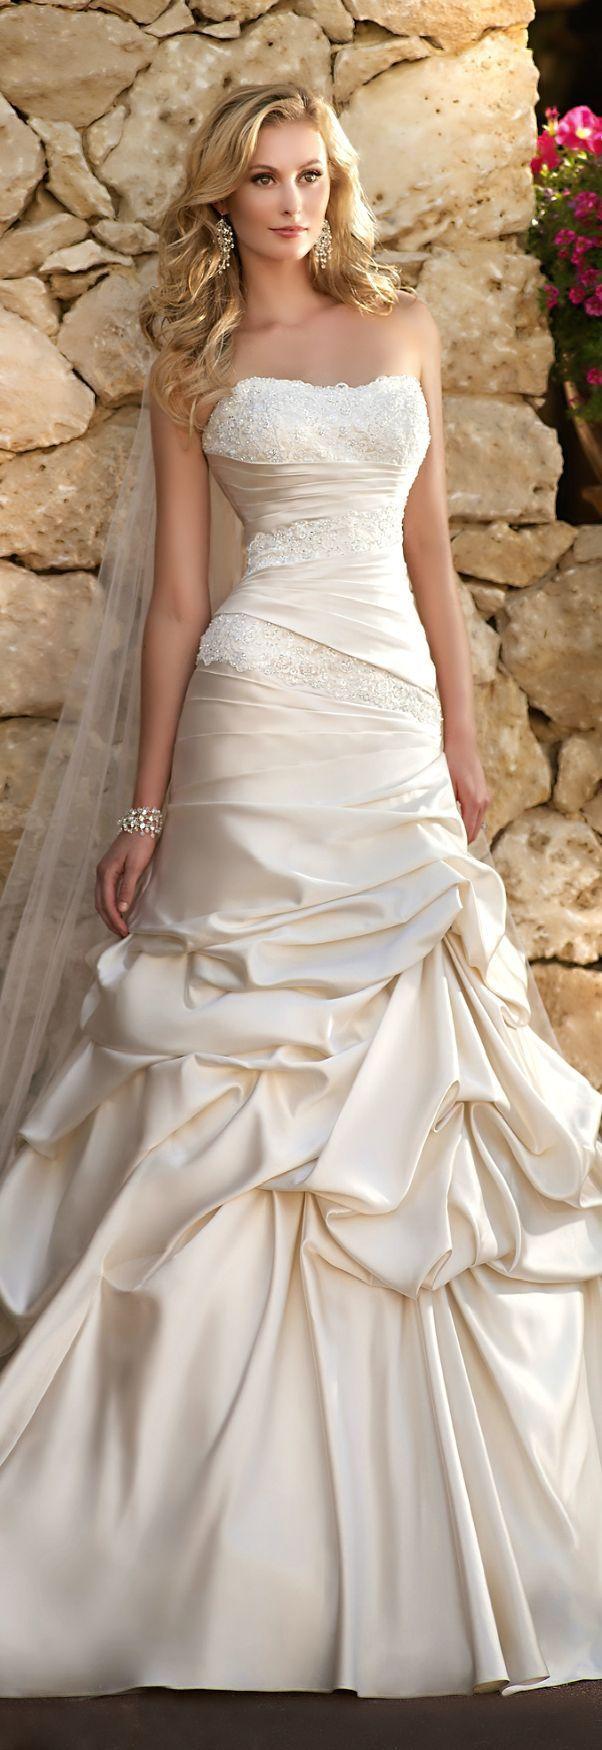 Exquisite satin u lace cascading ruffle wedding dress ium not a